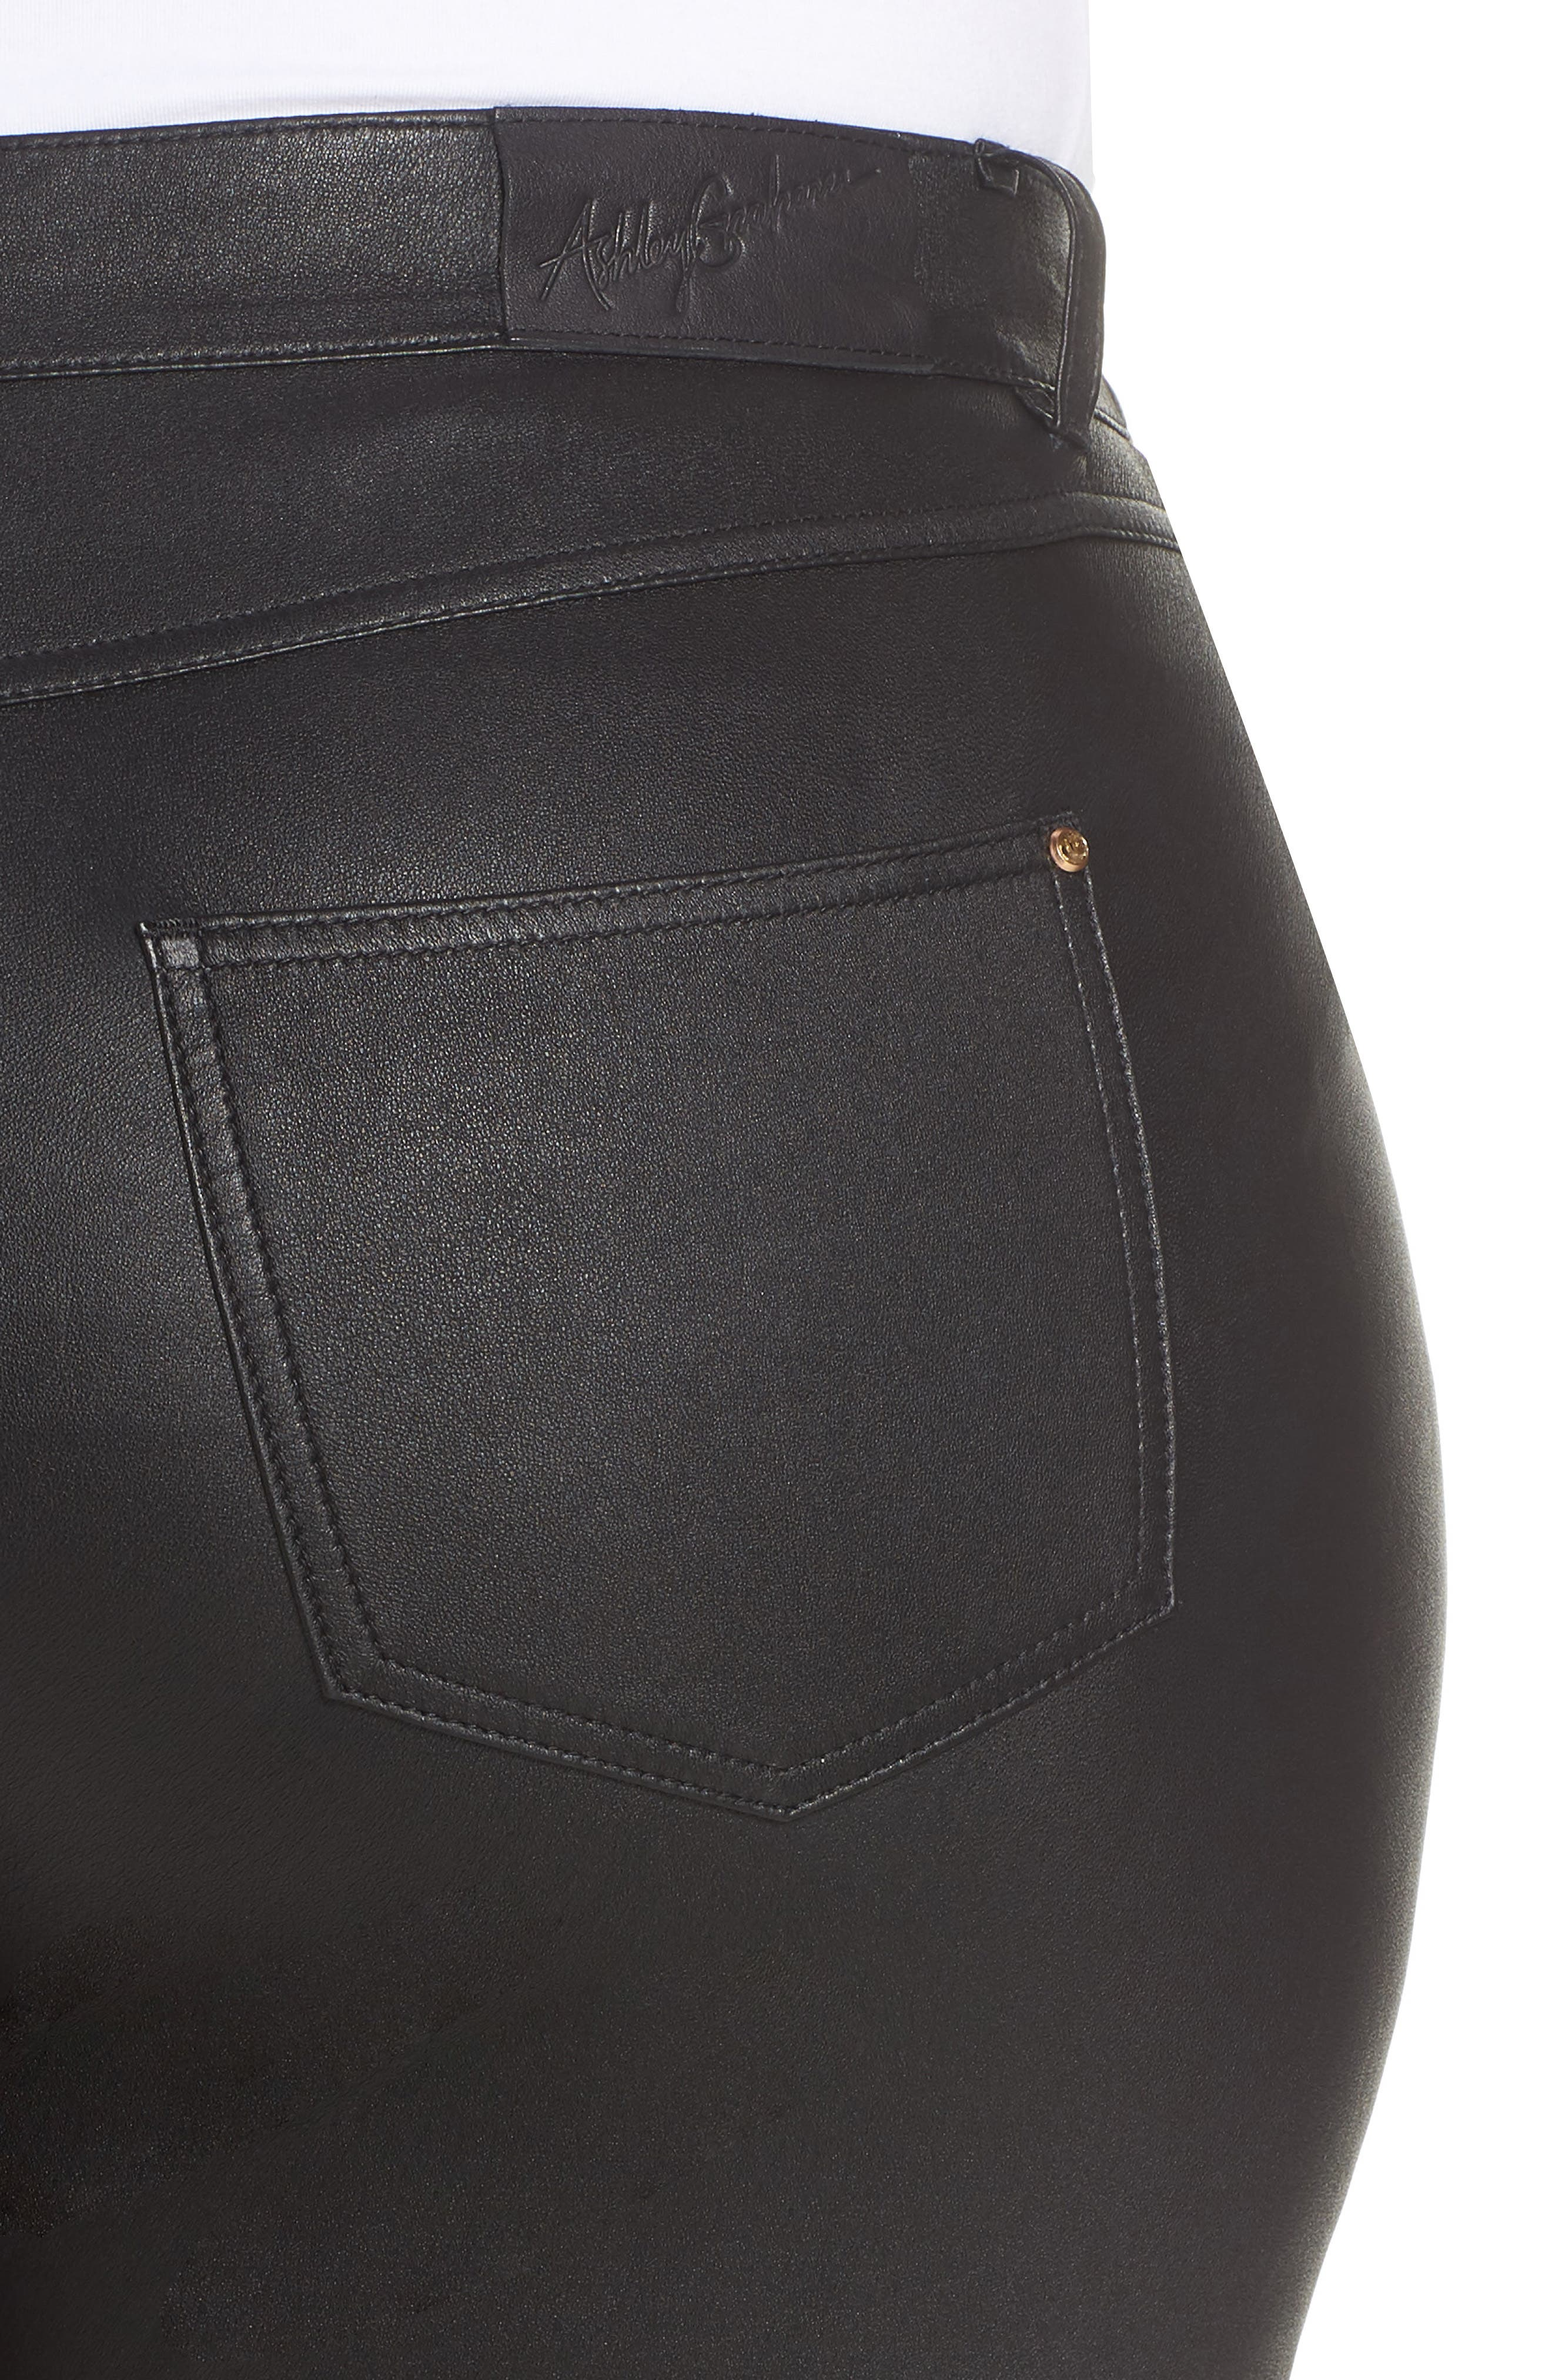 Eboli Leather Pants,                             Alternate thumbnail 4, color,                             001